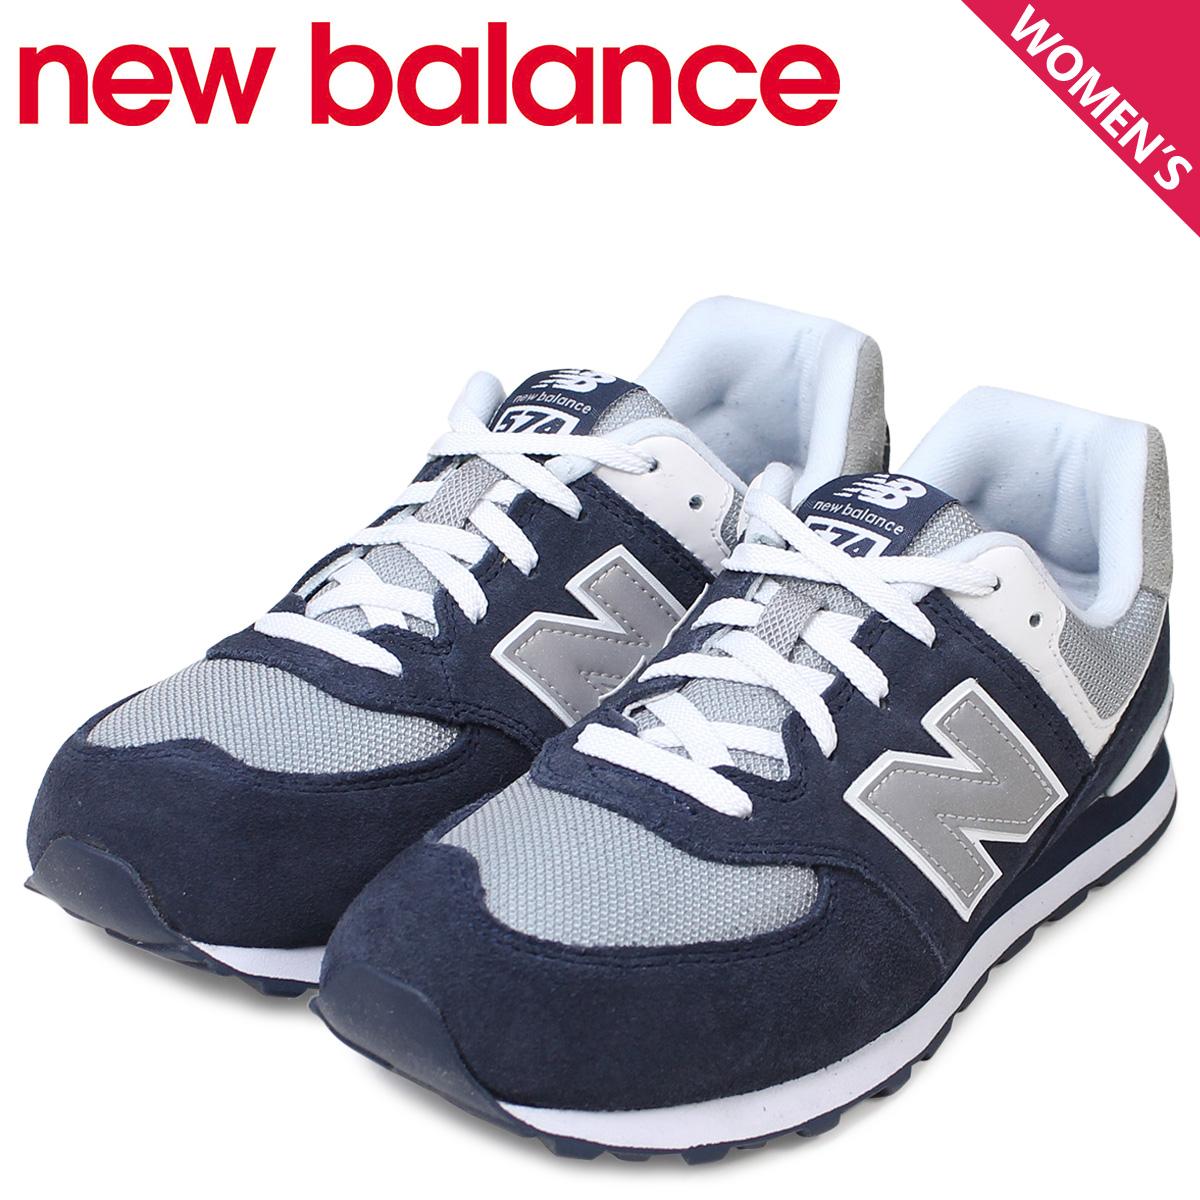 new balance navy 574